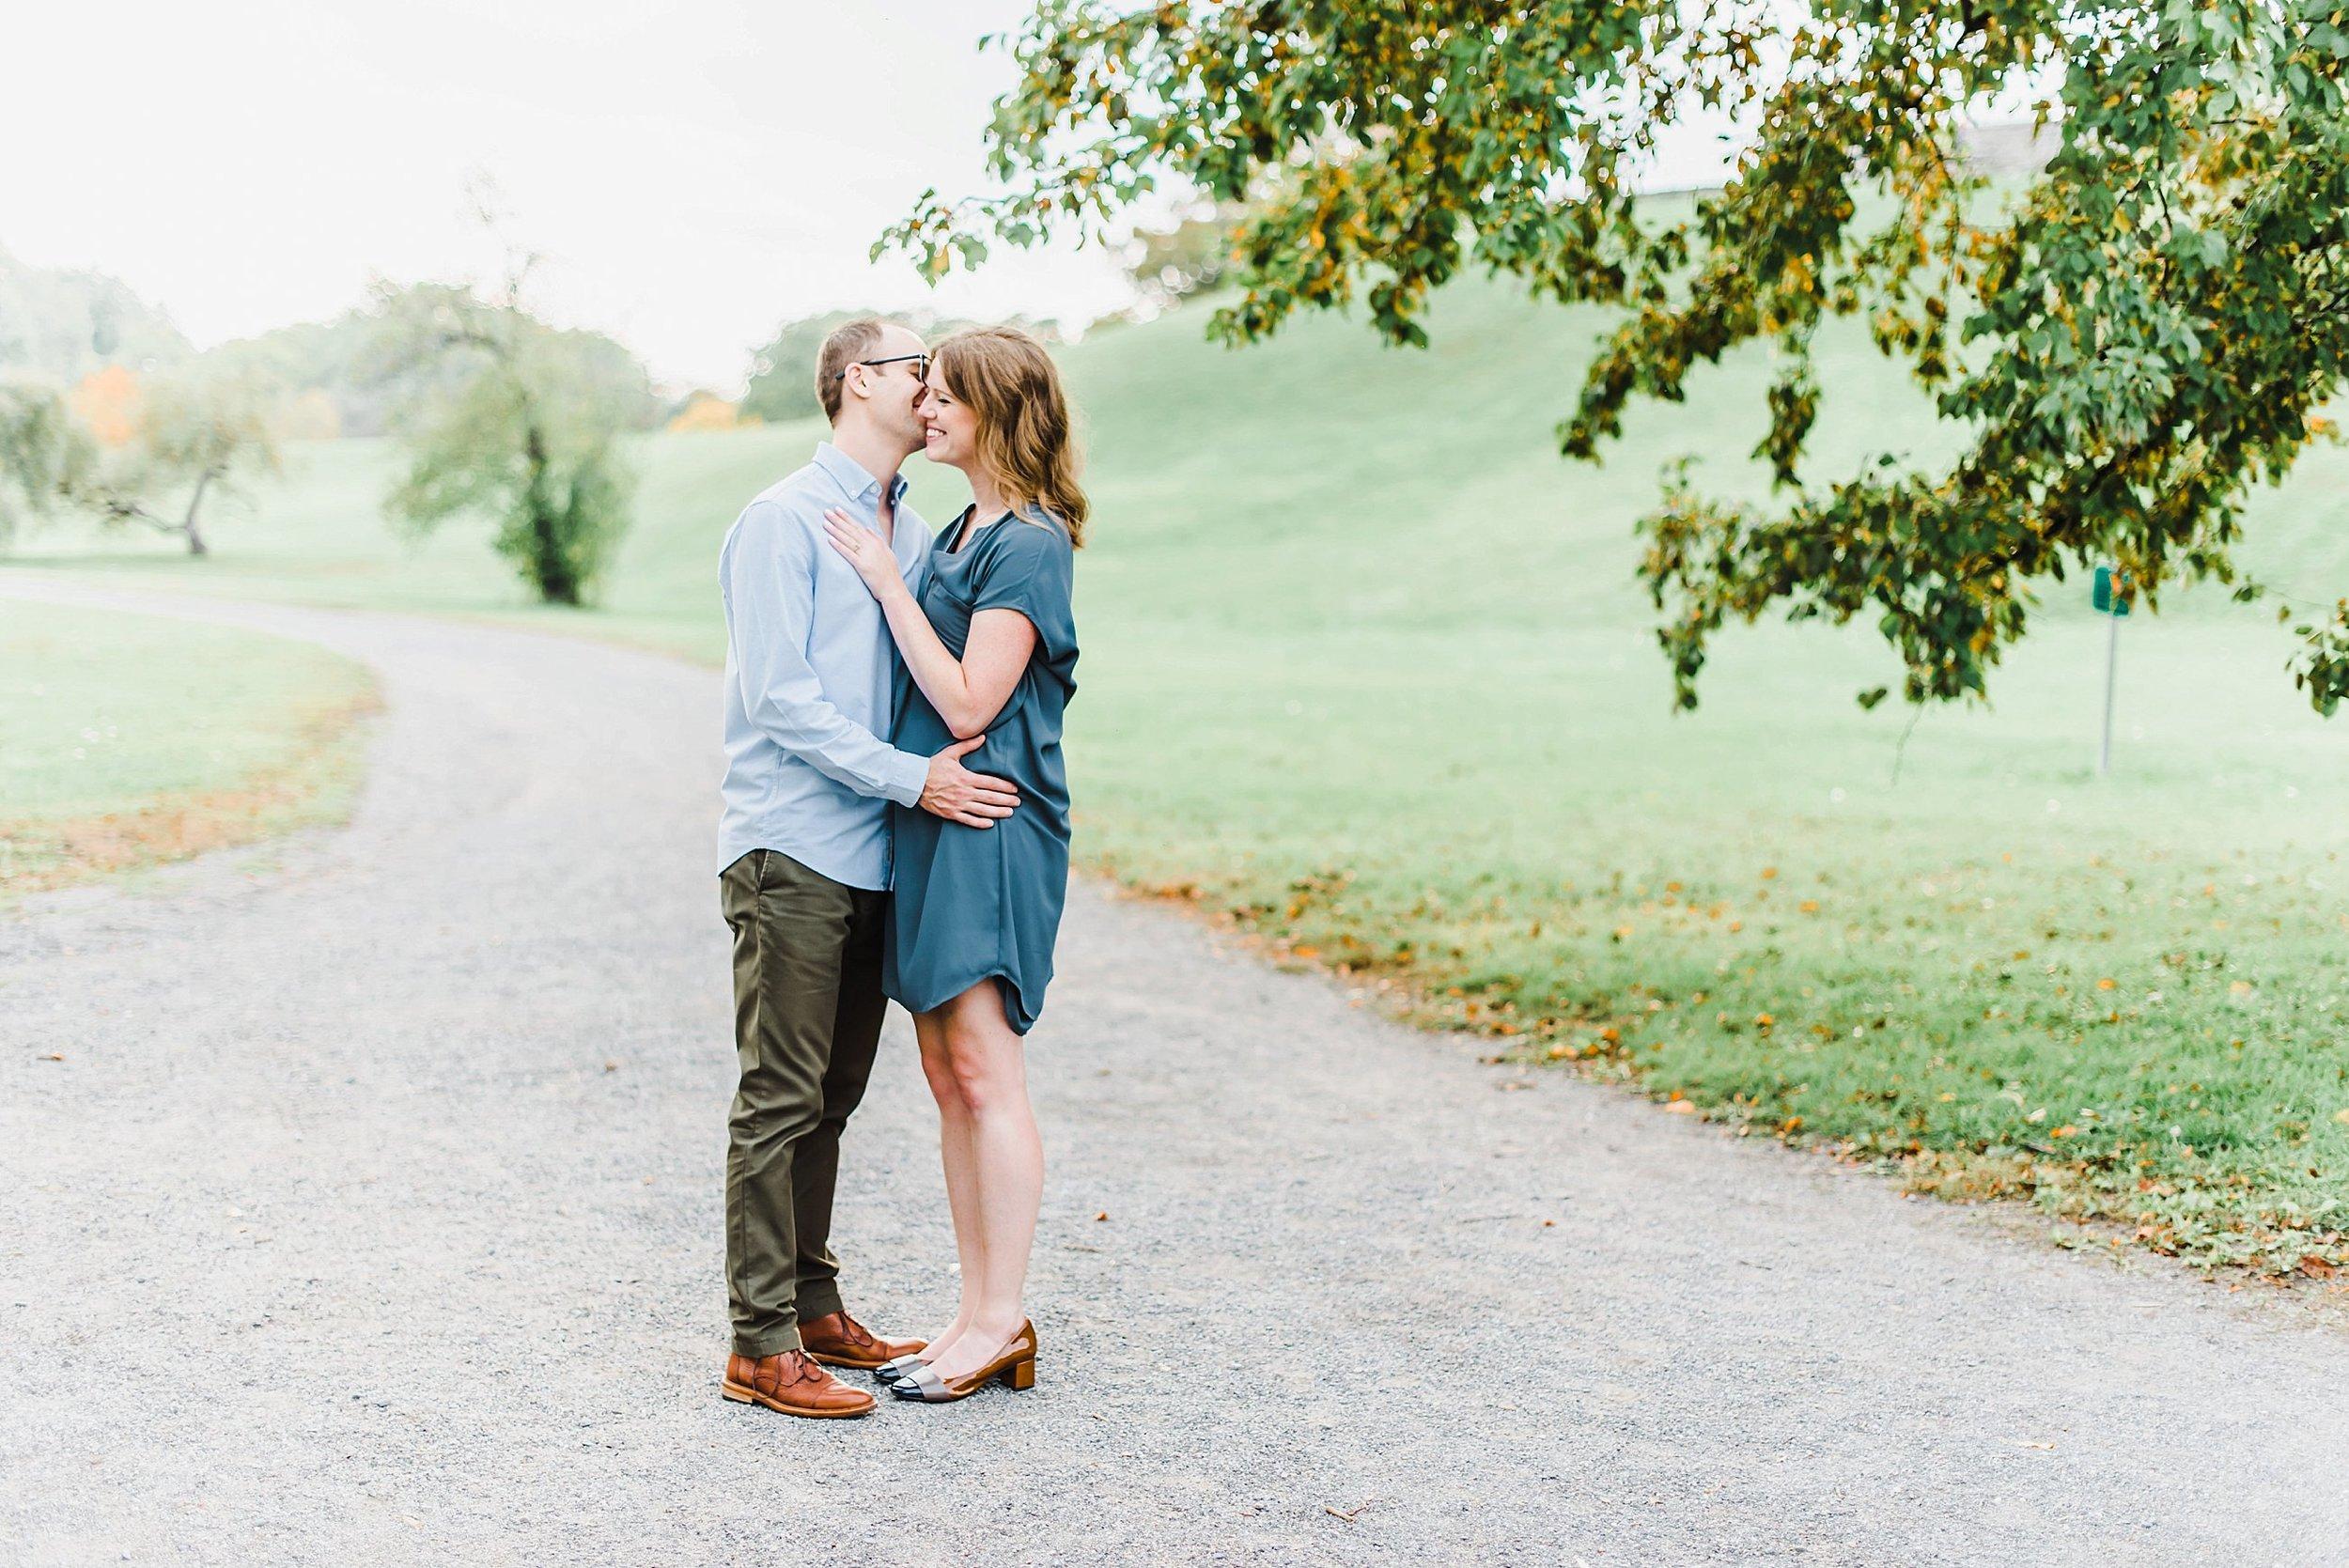 light airy indie fine art ottawa wedding photographer | Ali and Batoul Photography_1409.jpg